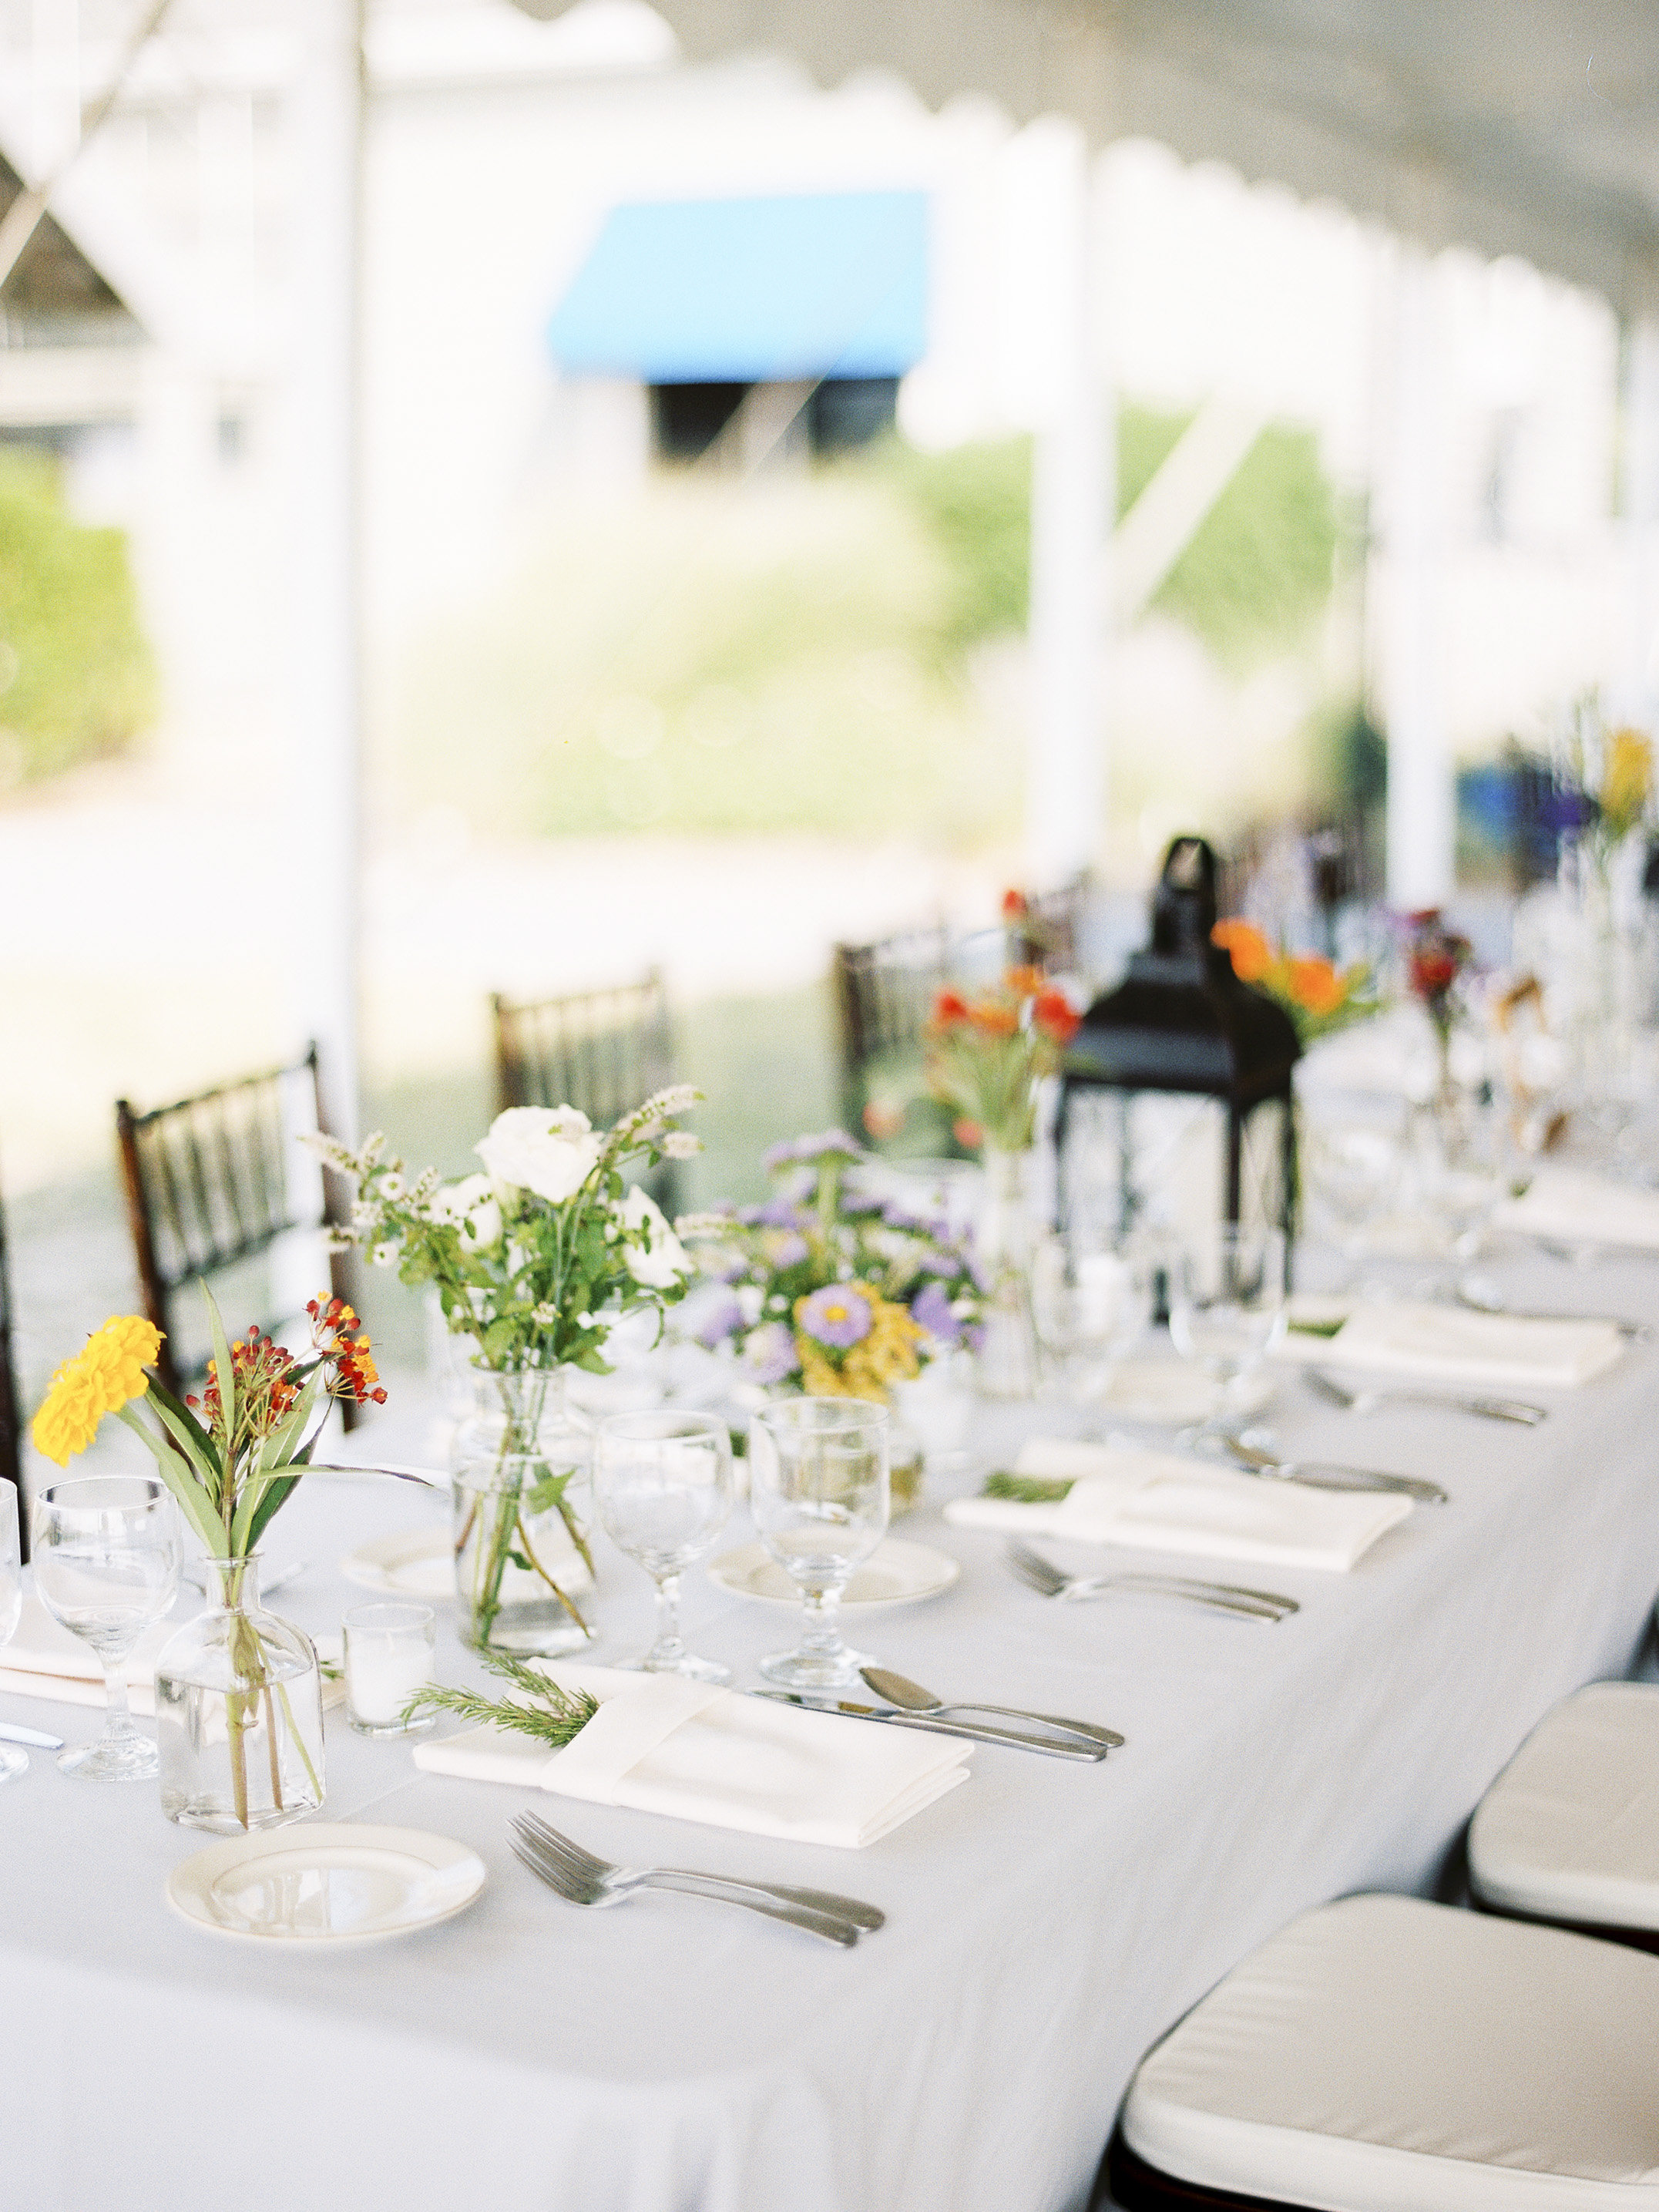 36 simple wedding centerpieces